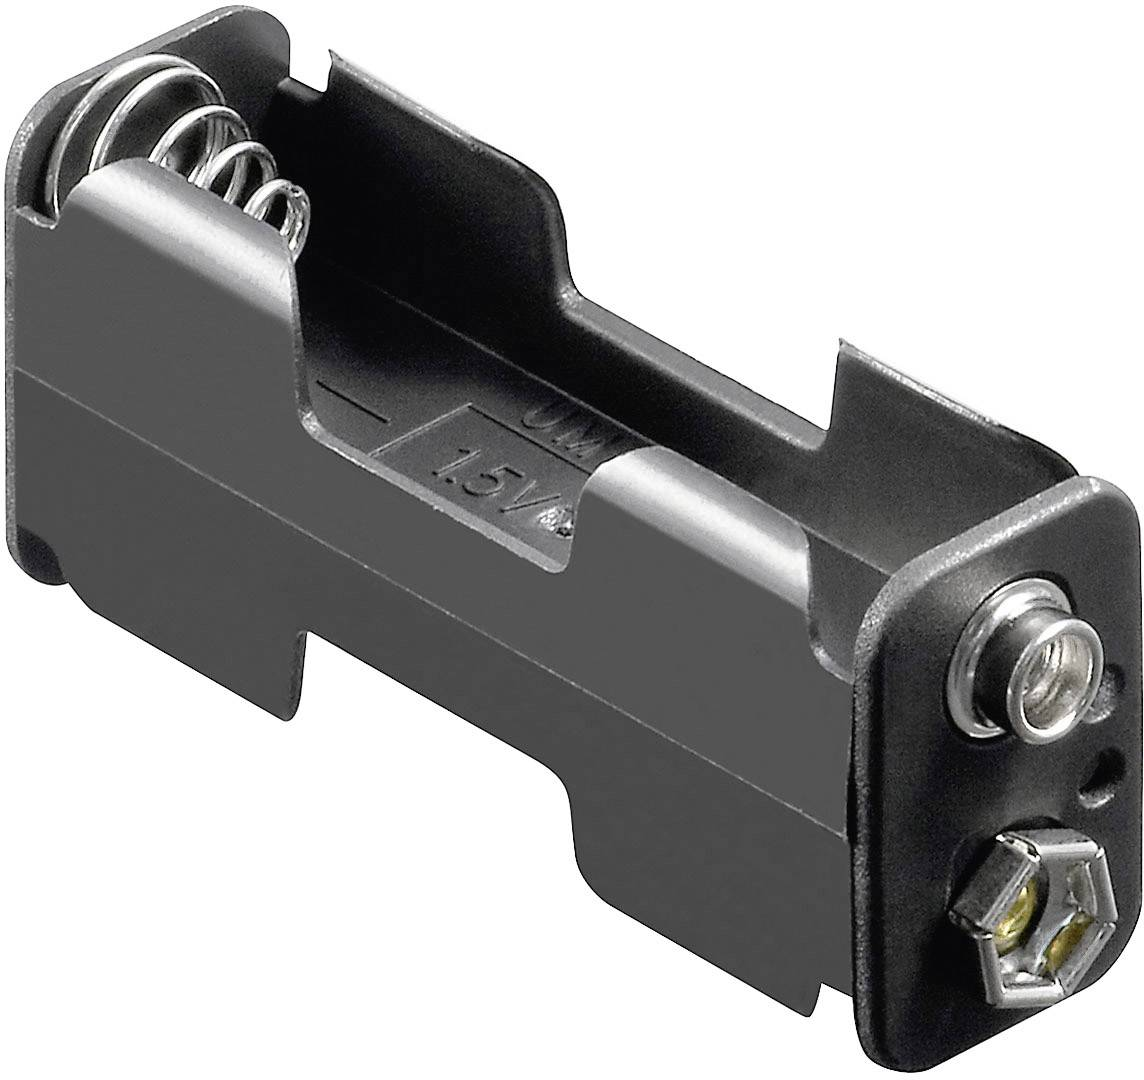 Batériový držák na 2x mignon (AA) Goobay 12461, (d x š x v) 60 x 26 x 16.5 mm